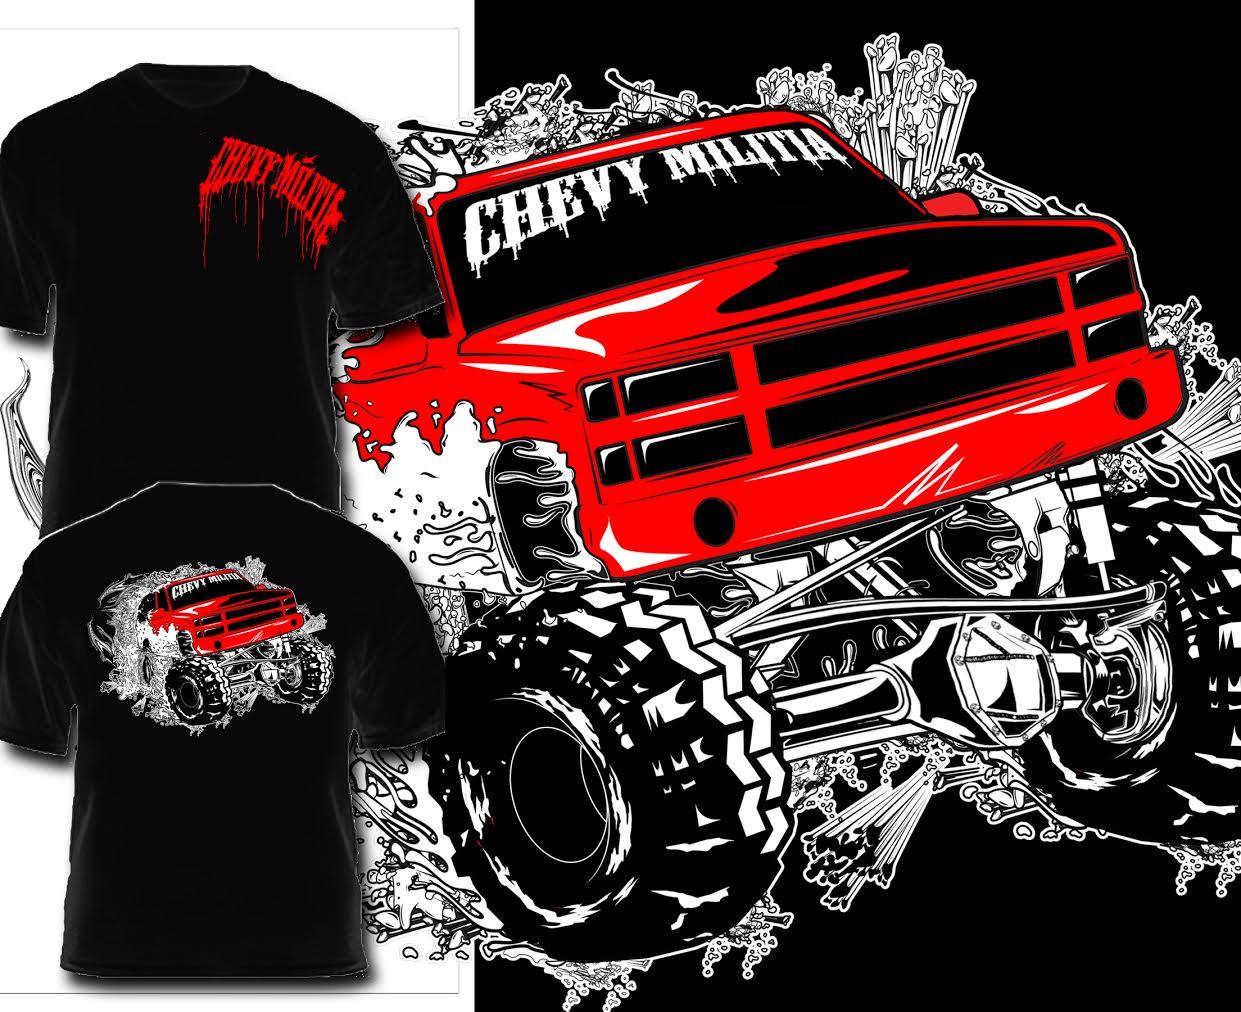 Big Red Chevy Militia